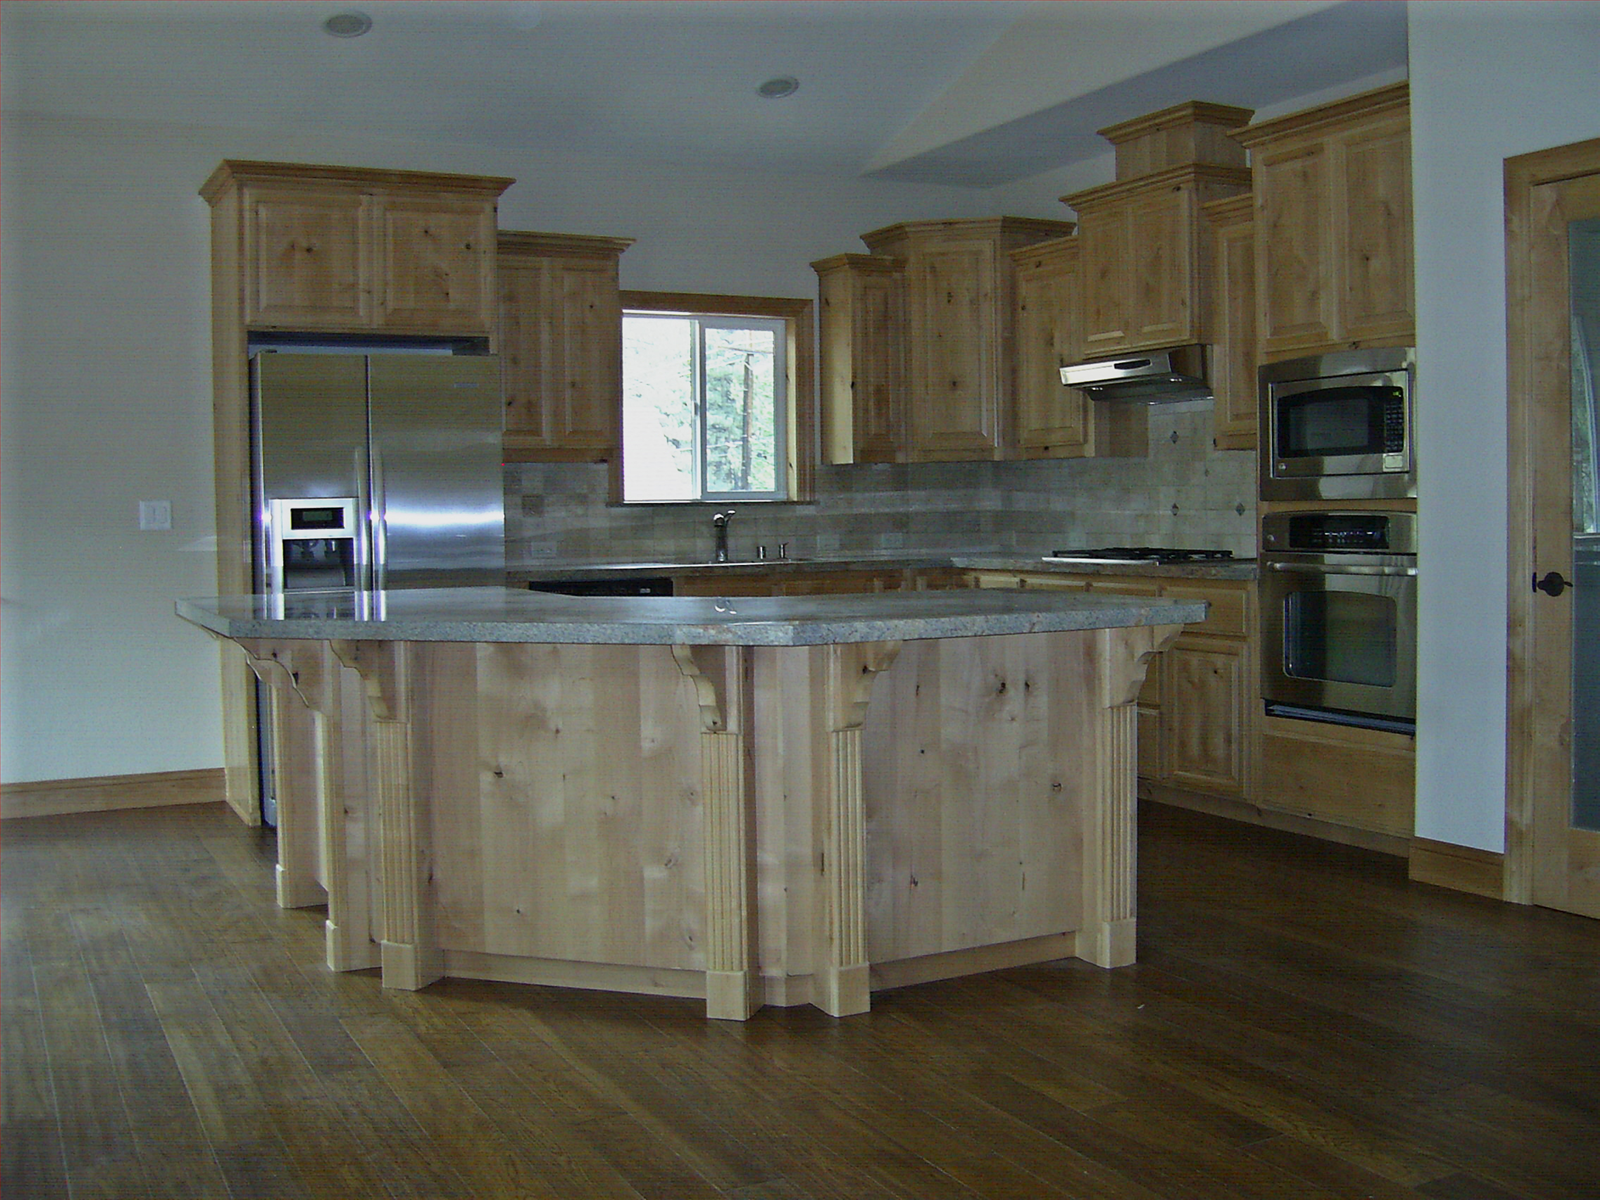 Natural Knotty Alder Wood Kitchen Cabinets | KNOTTY ALDER KITCHEN CABINET  DOORS   Cabinet Storage